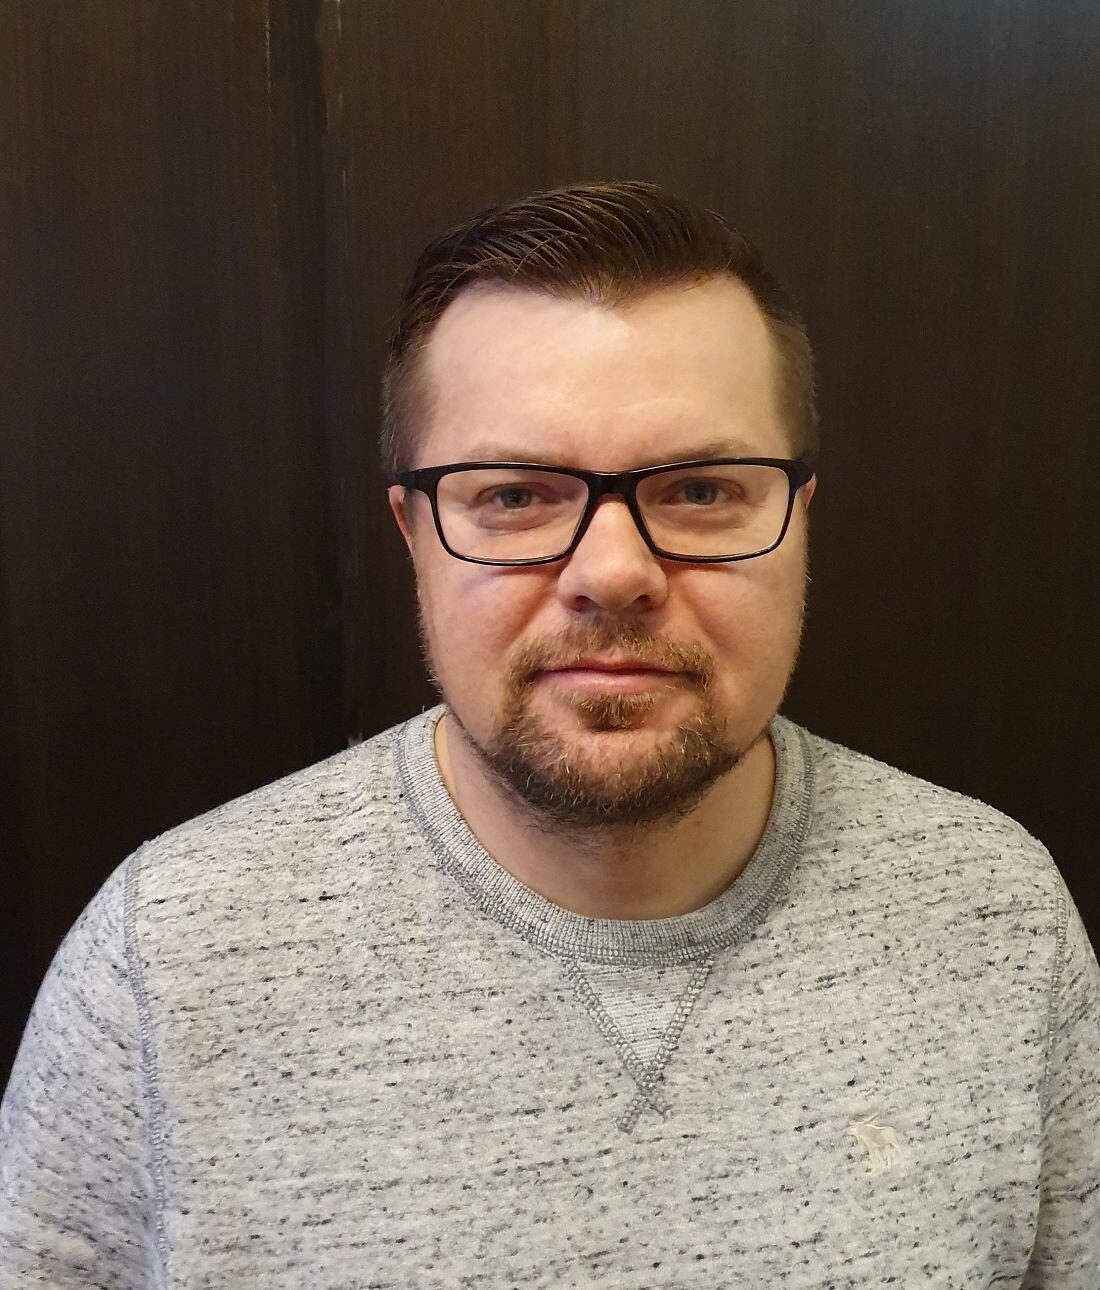 Kommunalsjef Hans Solbrekken Ruud